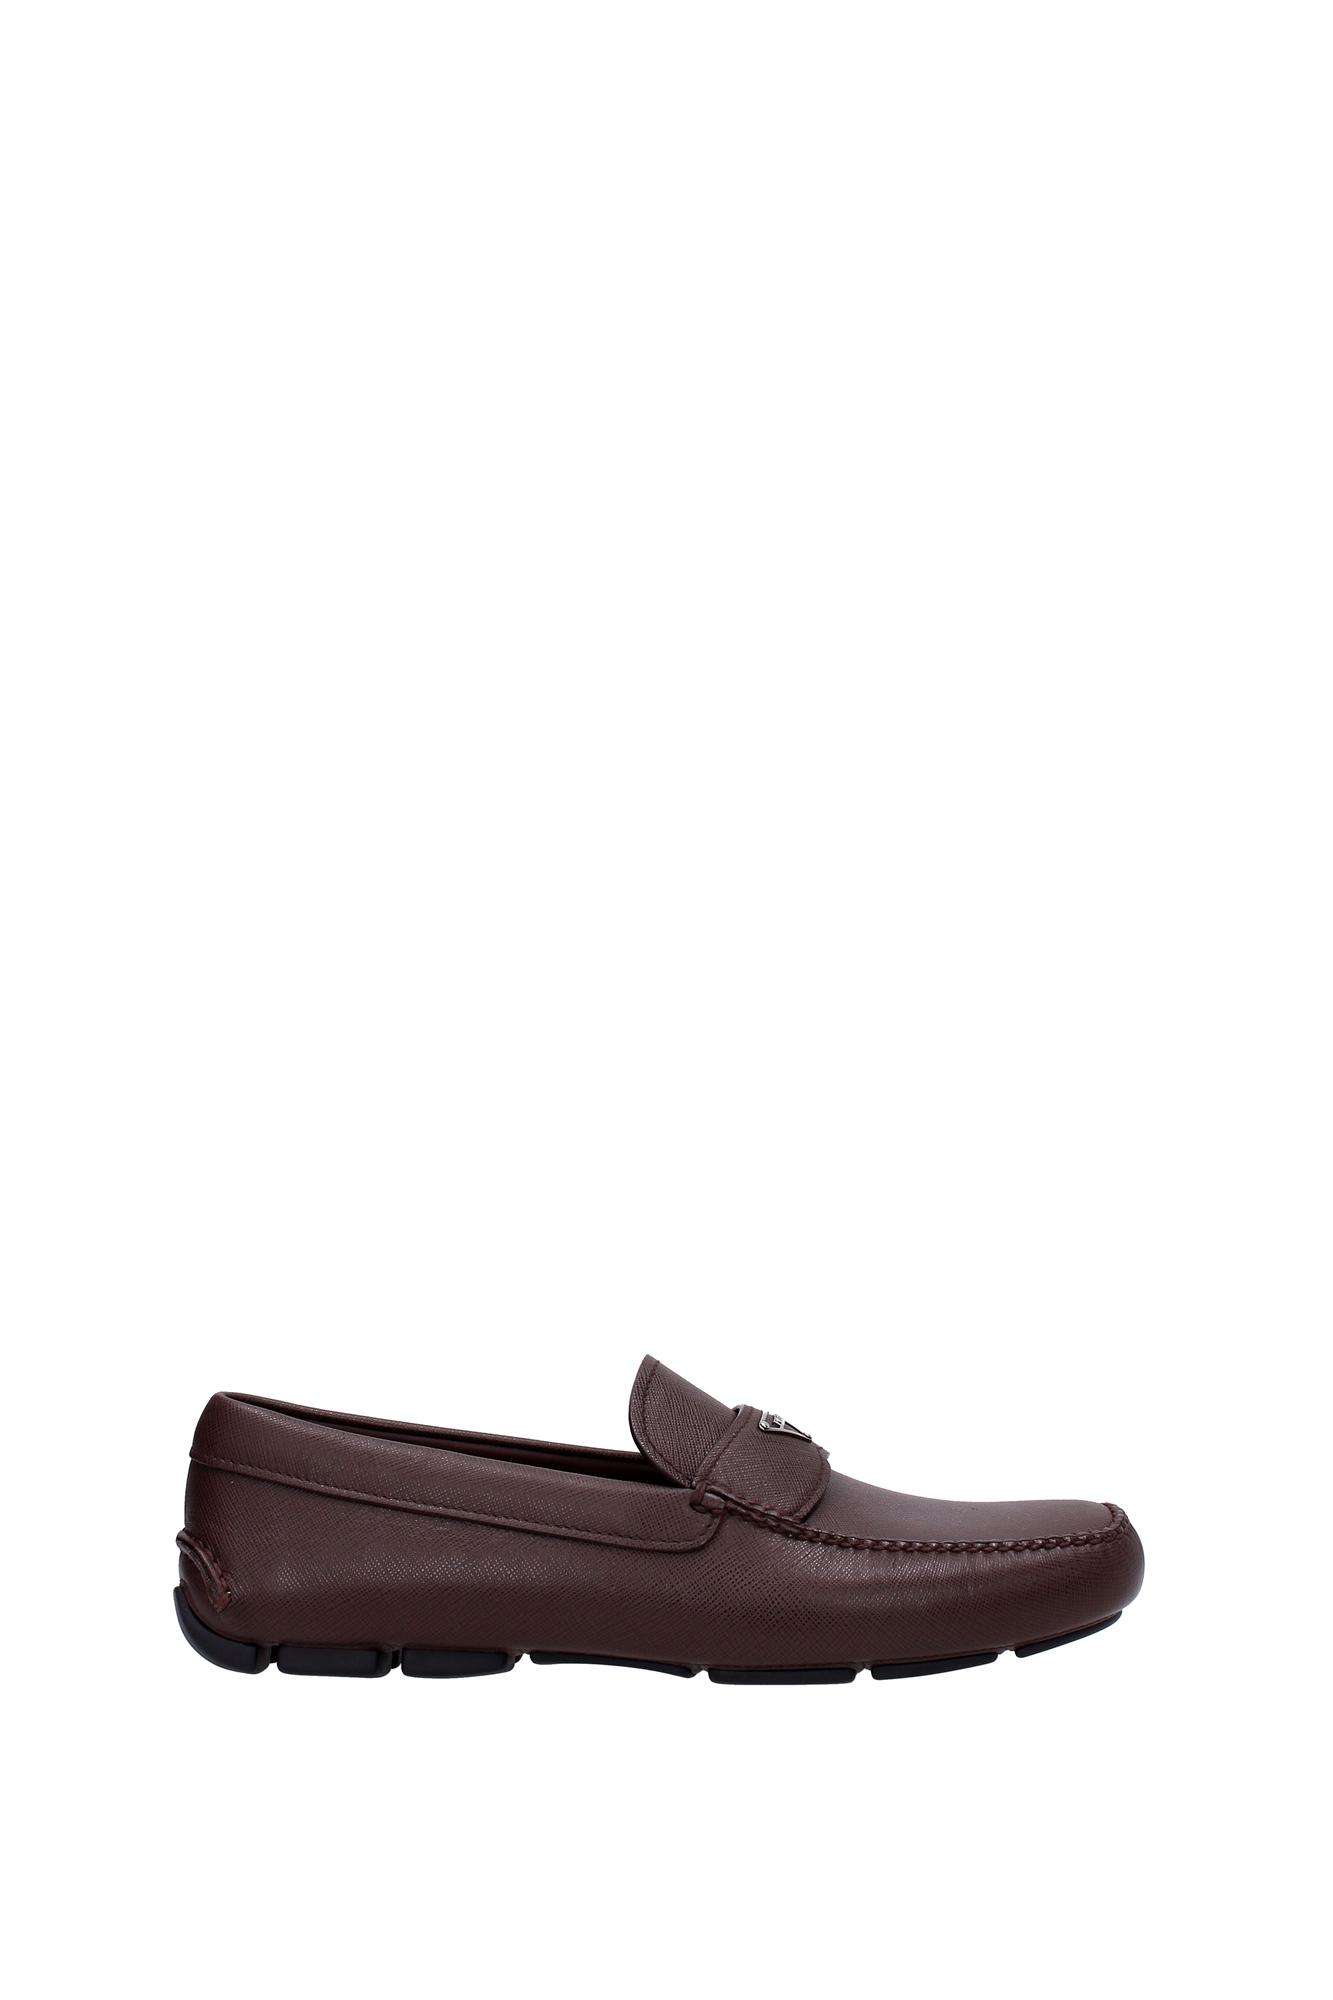 Gentleman/Lady Loafers Men Prada Men Loafers - Leather (2DD126CAFFE) service Modern design Explosive good goods 9a4389